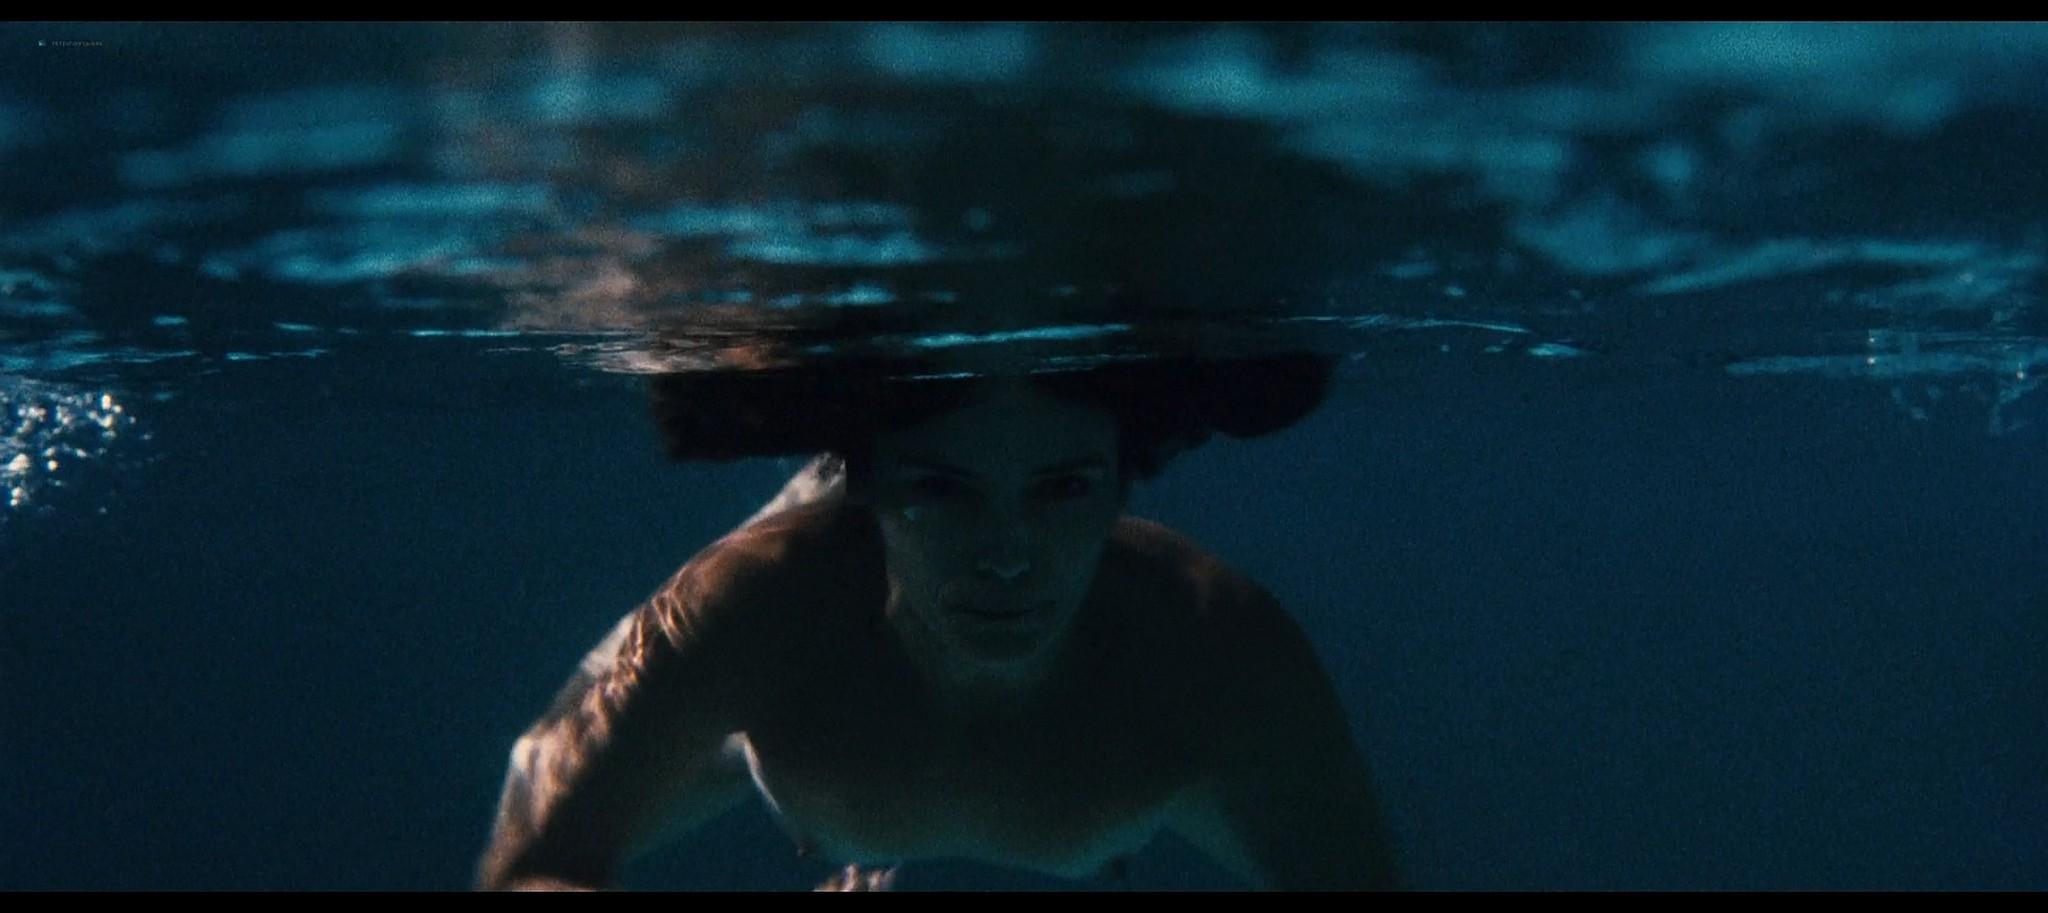 Sabrina Ferilli nude Anita Kravos full frontal Galatea Ranzi and others nude and sexy The Great Beauty IT 2013 1080p BluRey 9